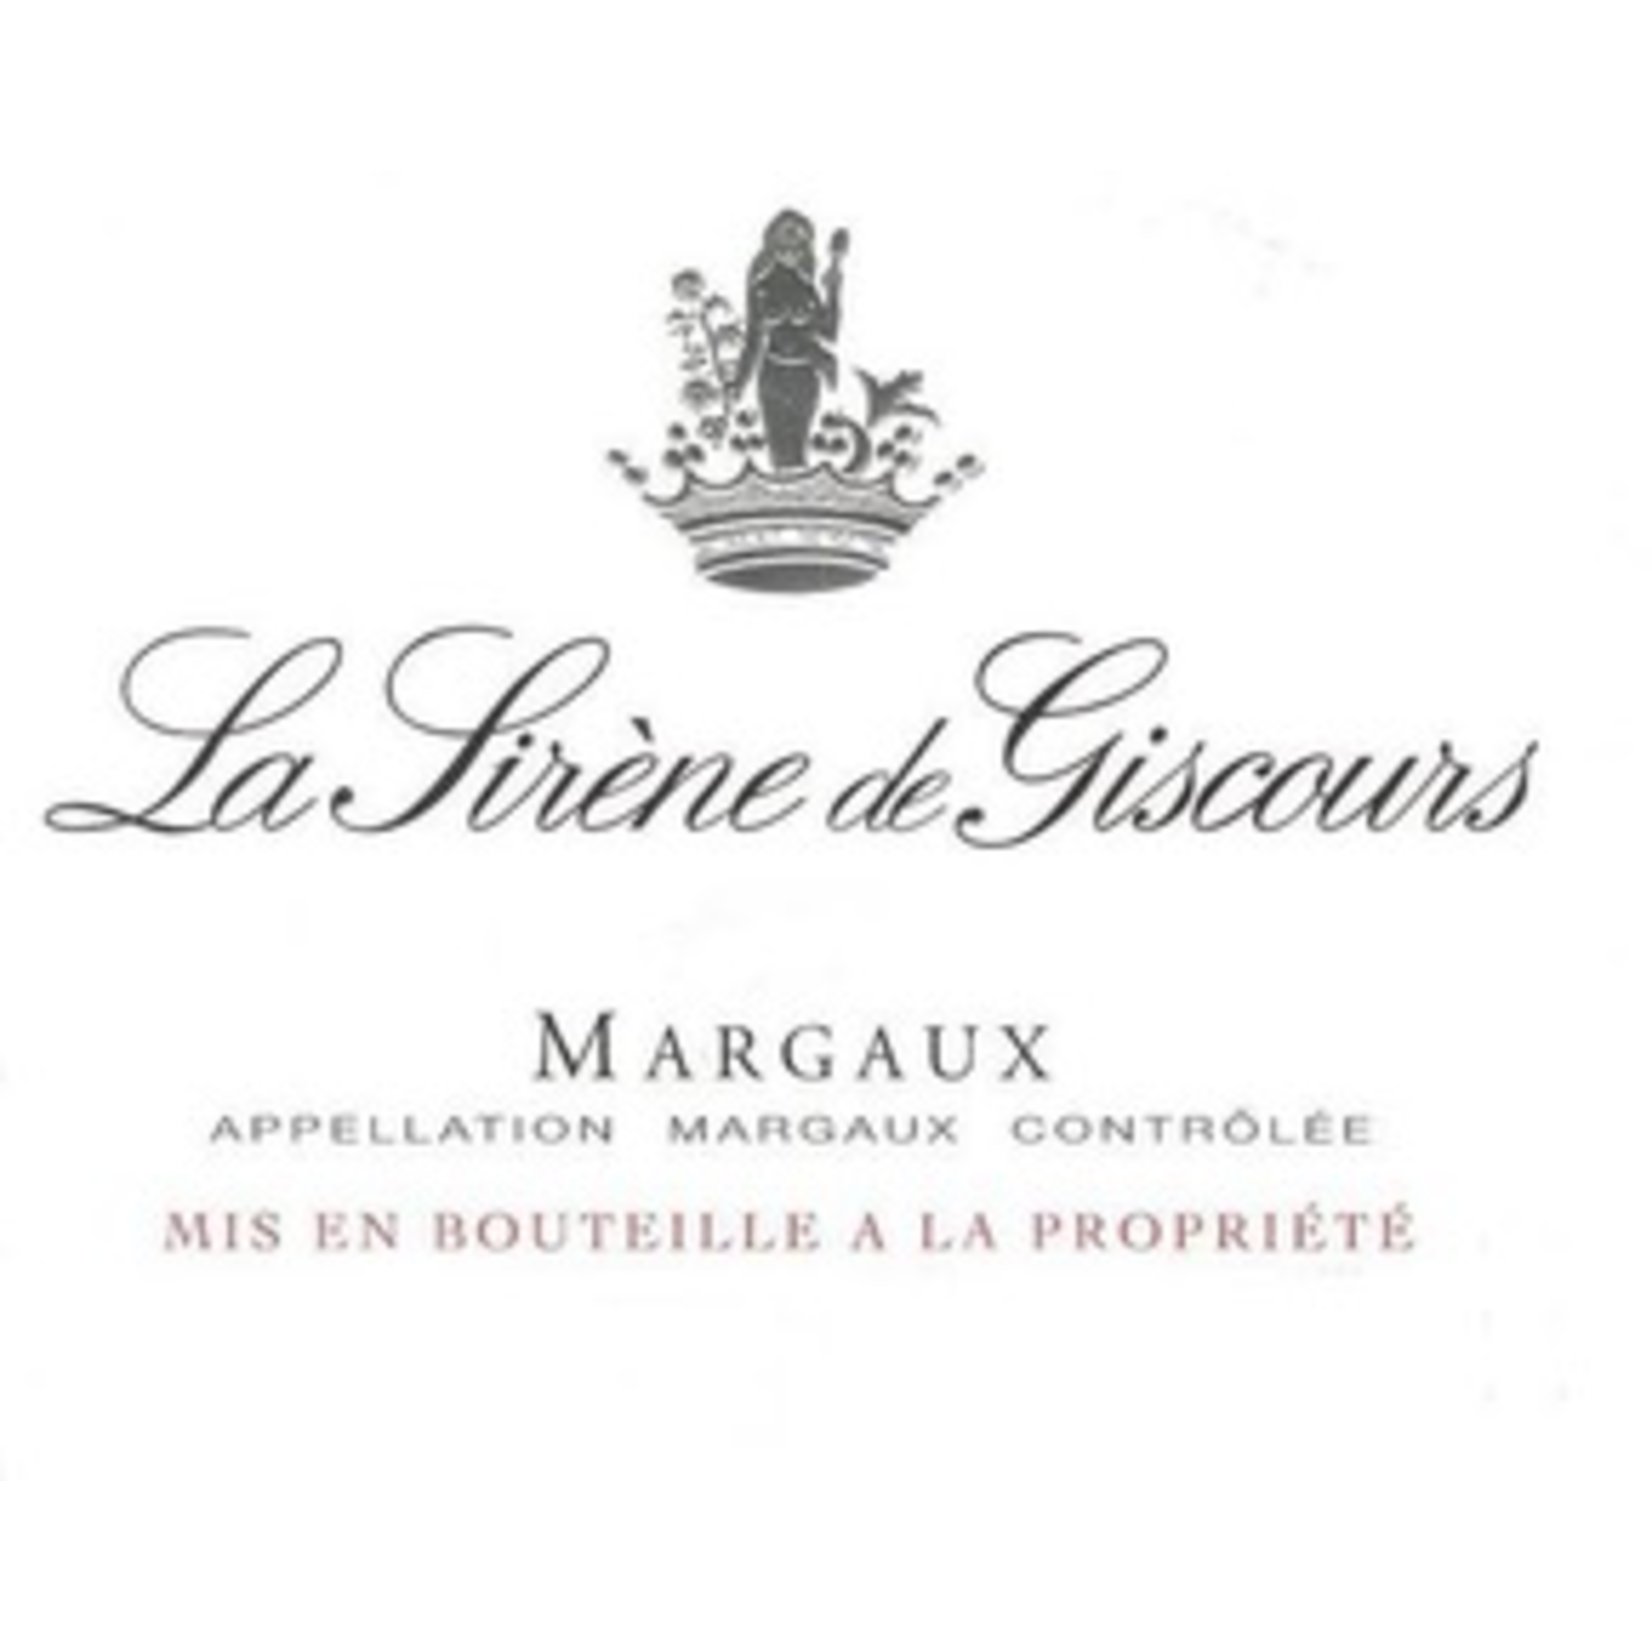 Wine La Sirene de Giscours 2014 3L